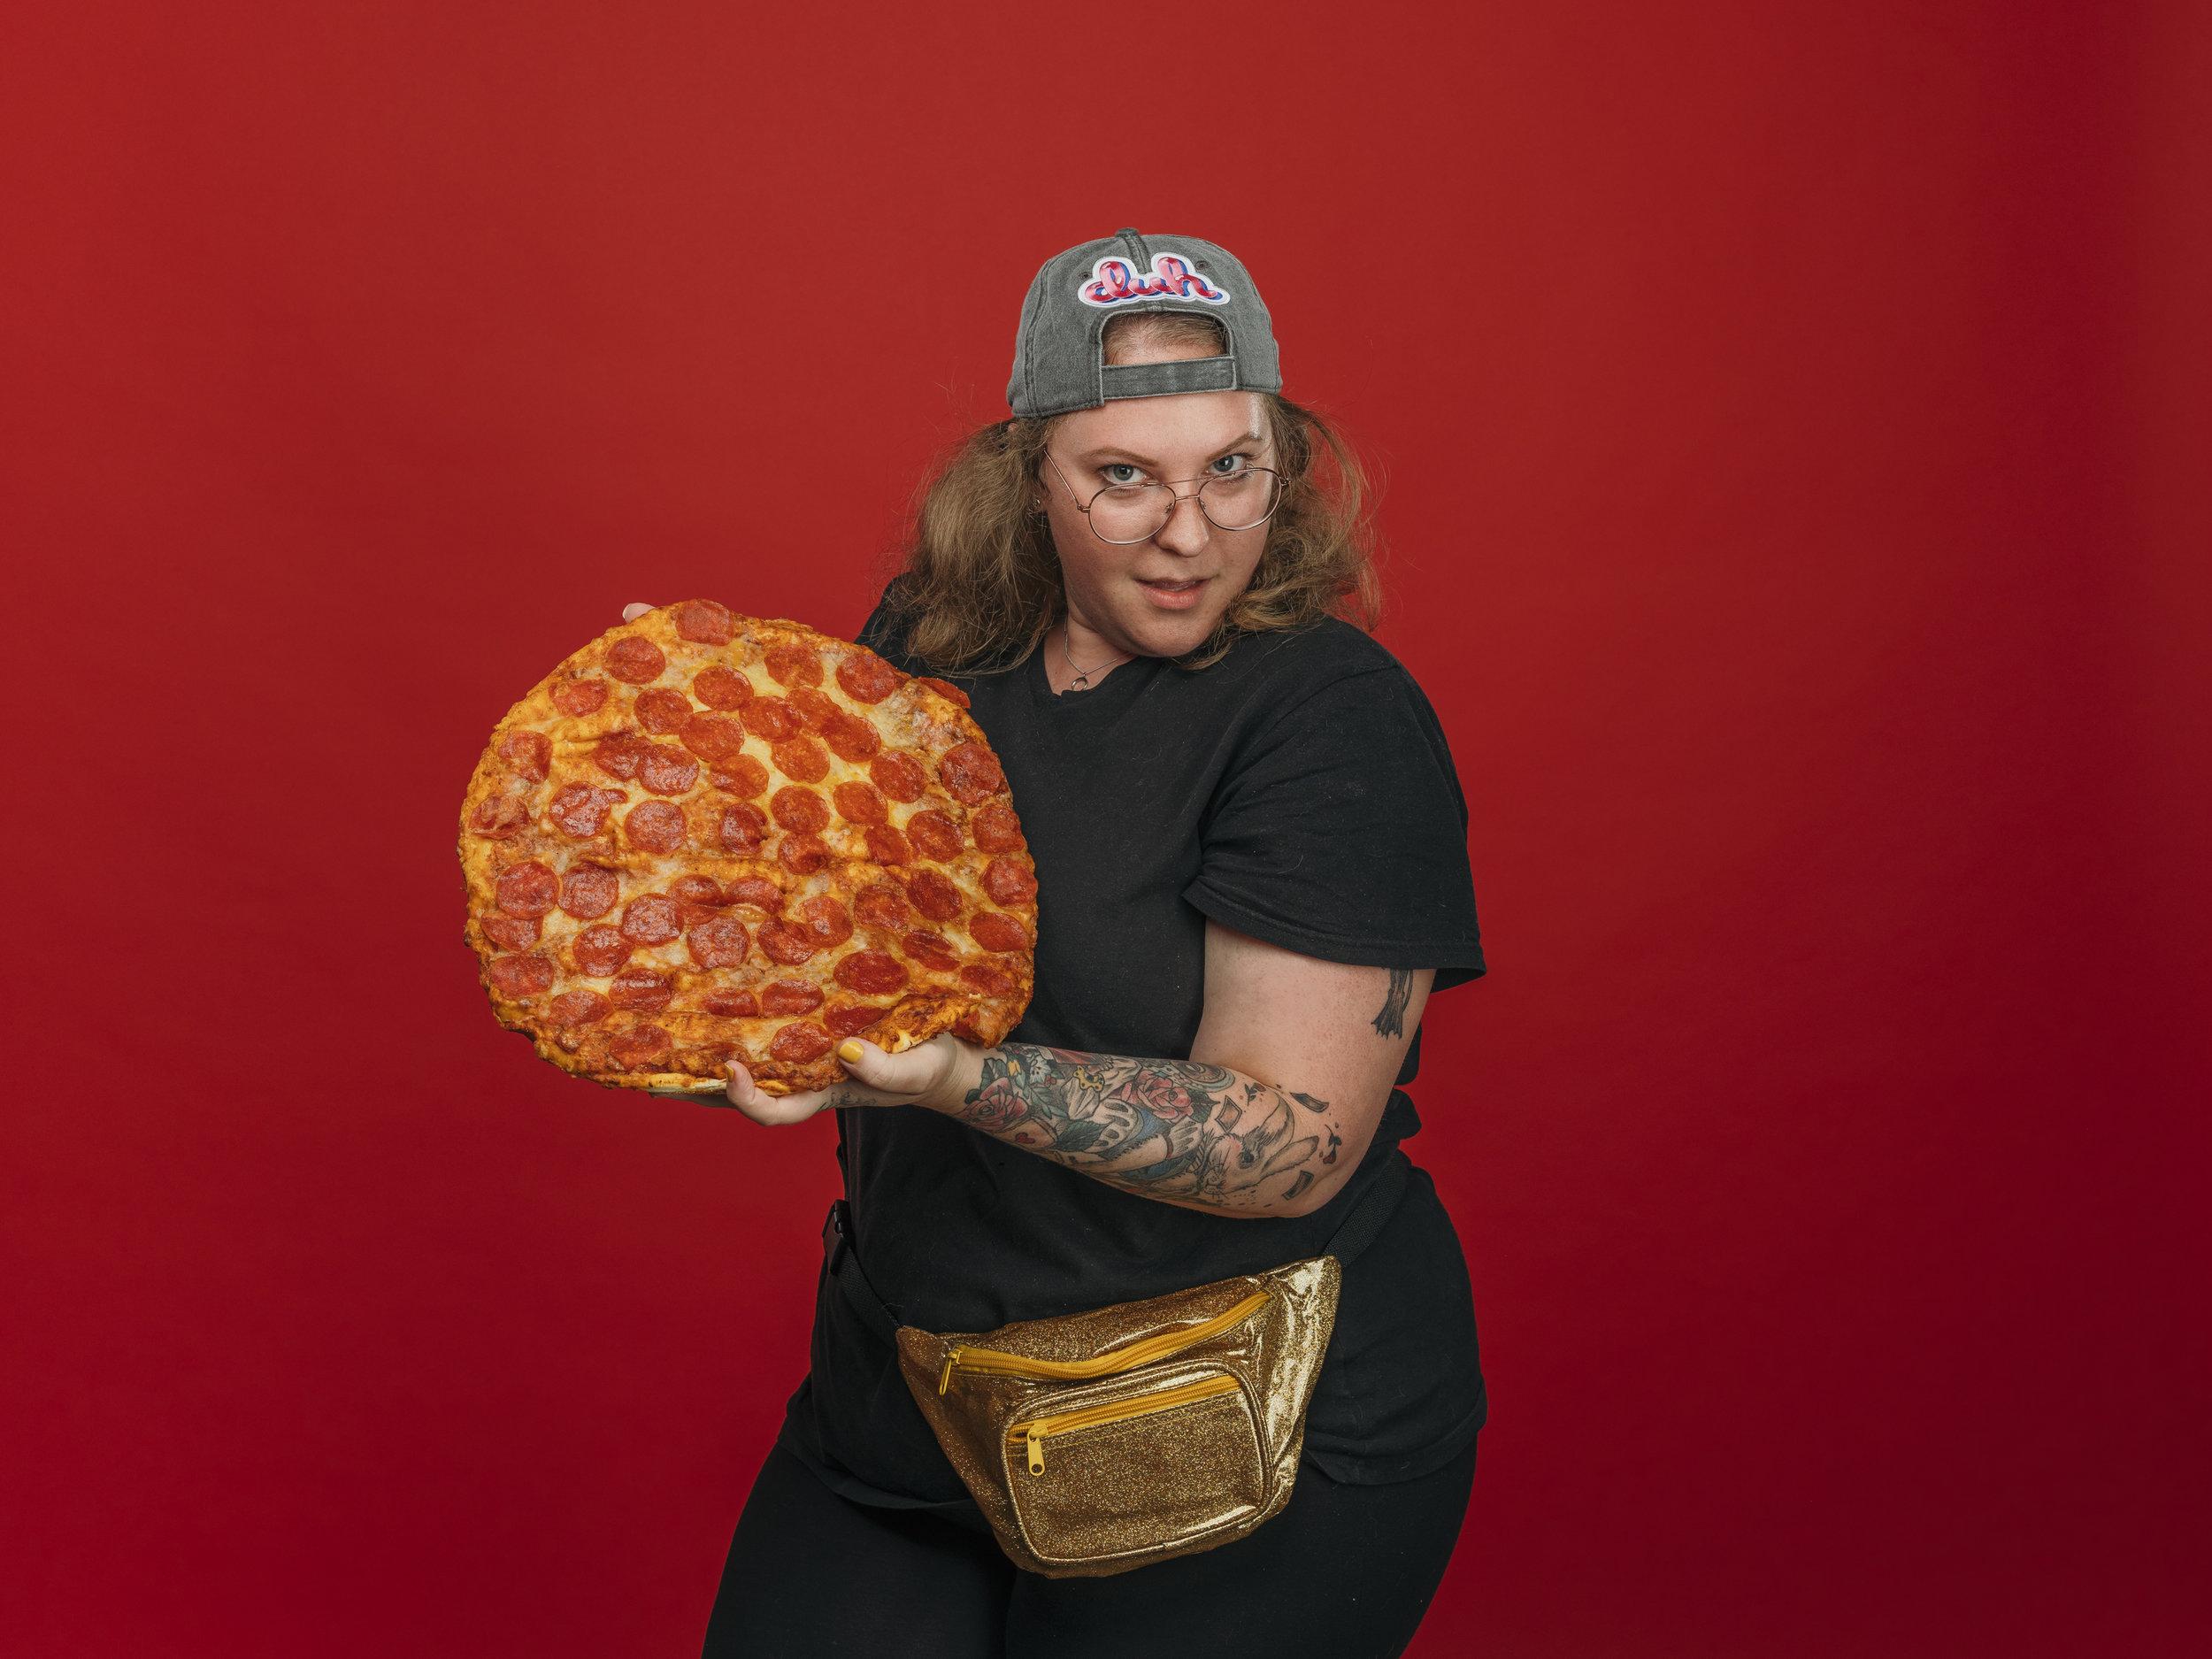 PizzaPortraitsResized-158.jpg